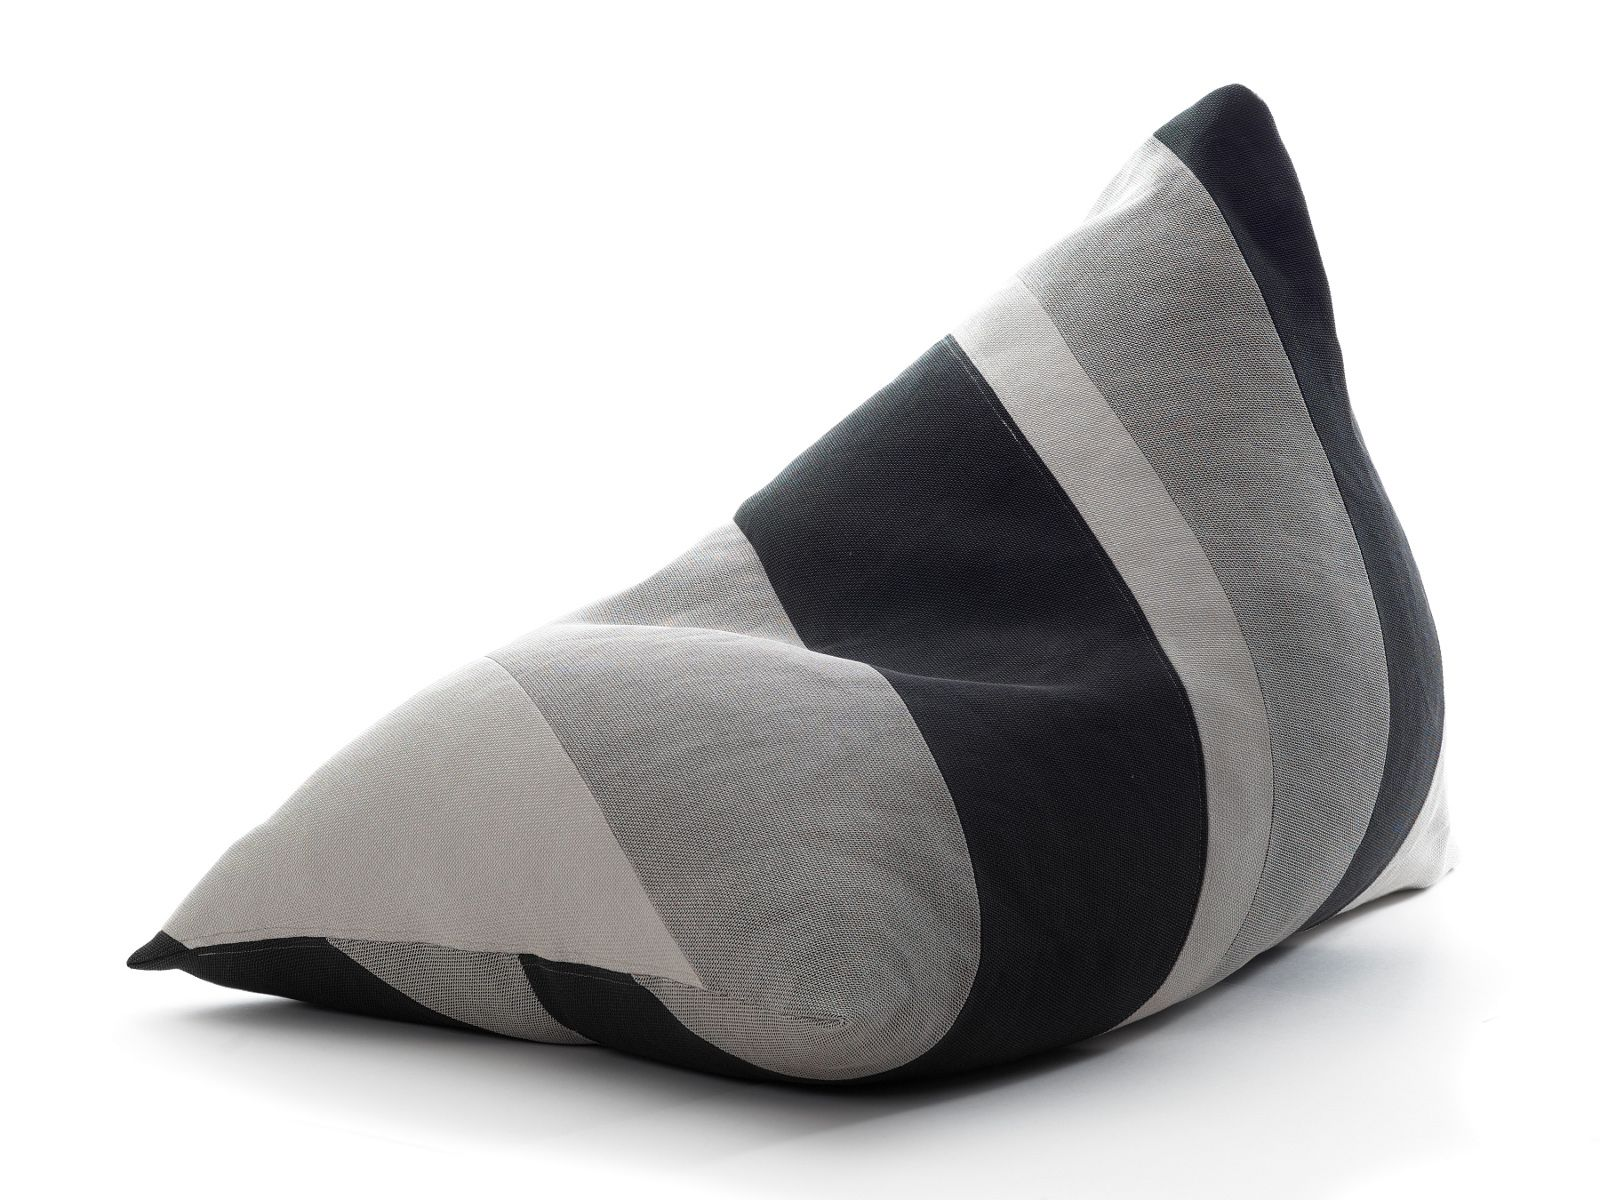 Poltrona a sacco in tessuto MY by Woodnotes design Ulla Koskinen